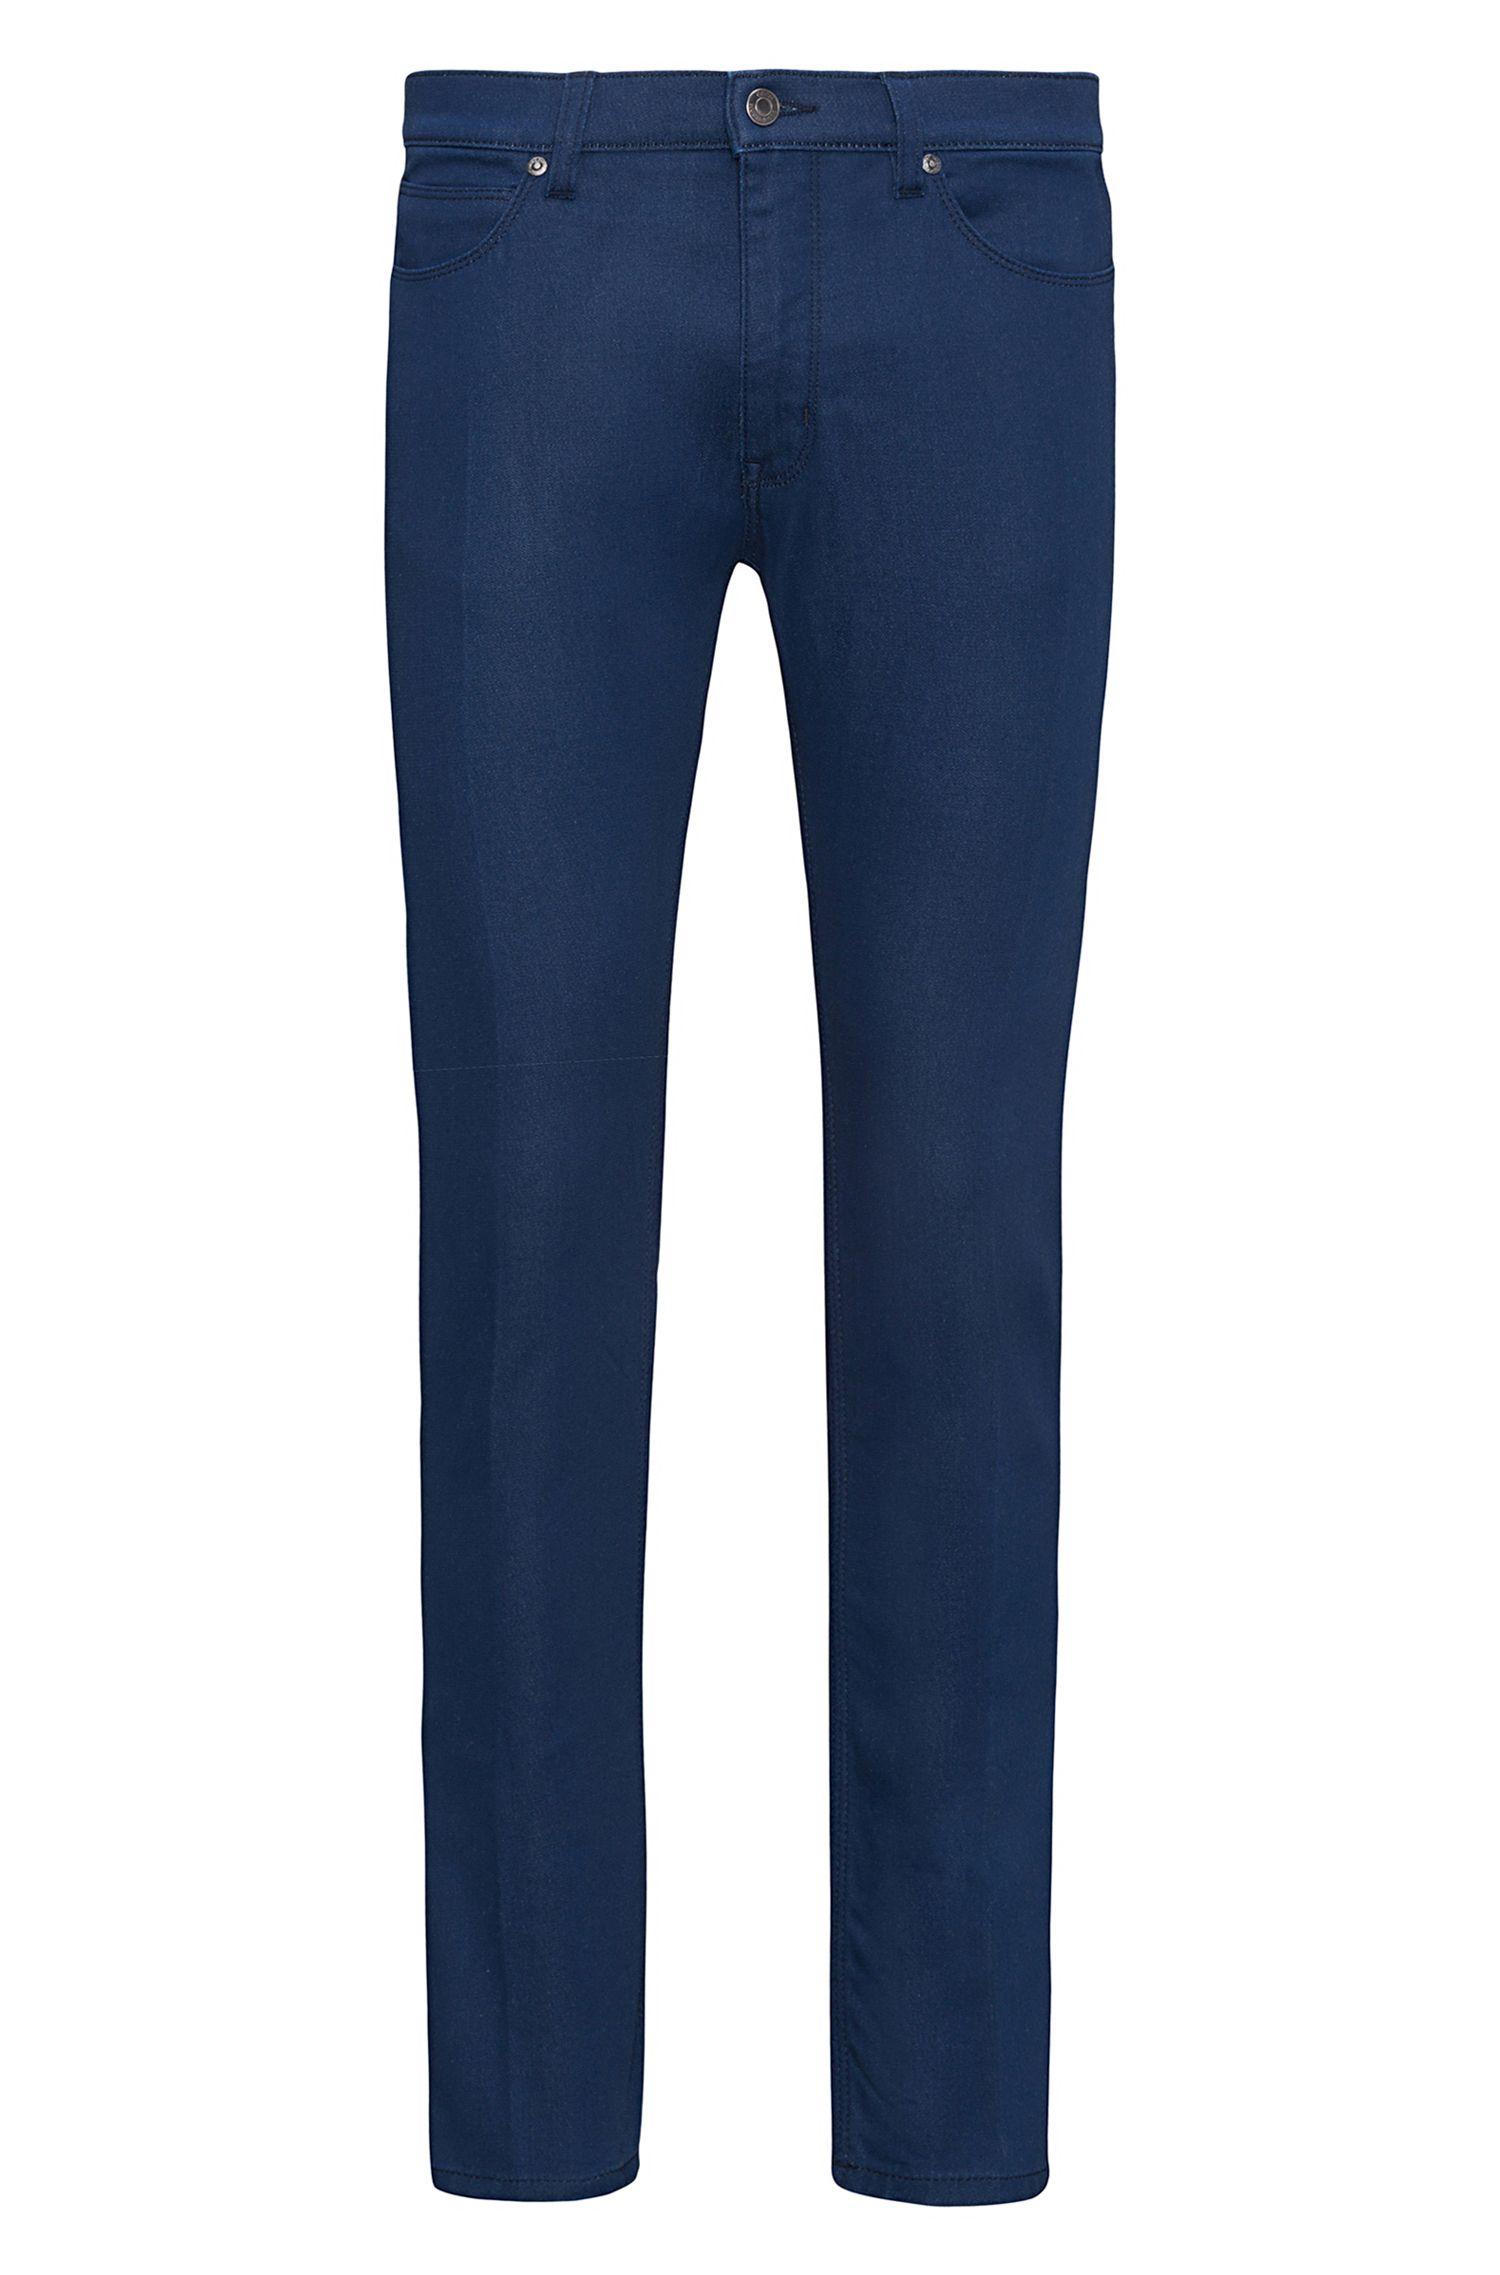 Jeans skinny fit blu medio in denim elasticizzato